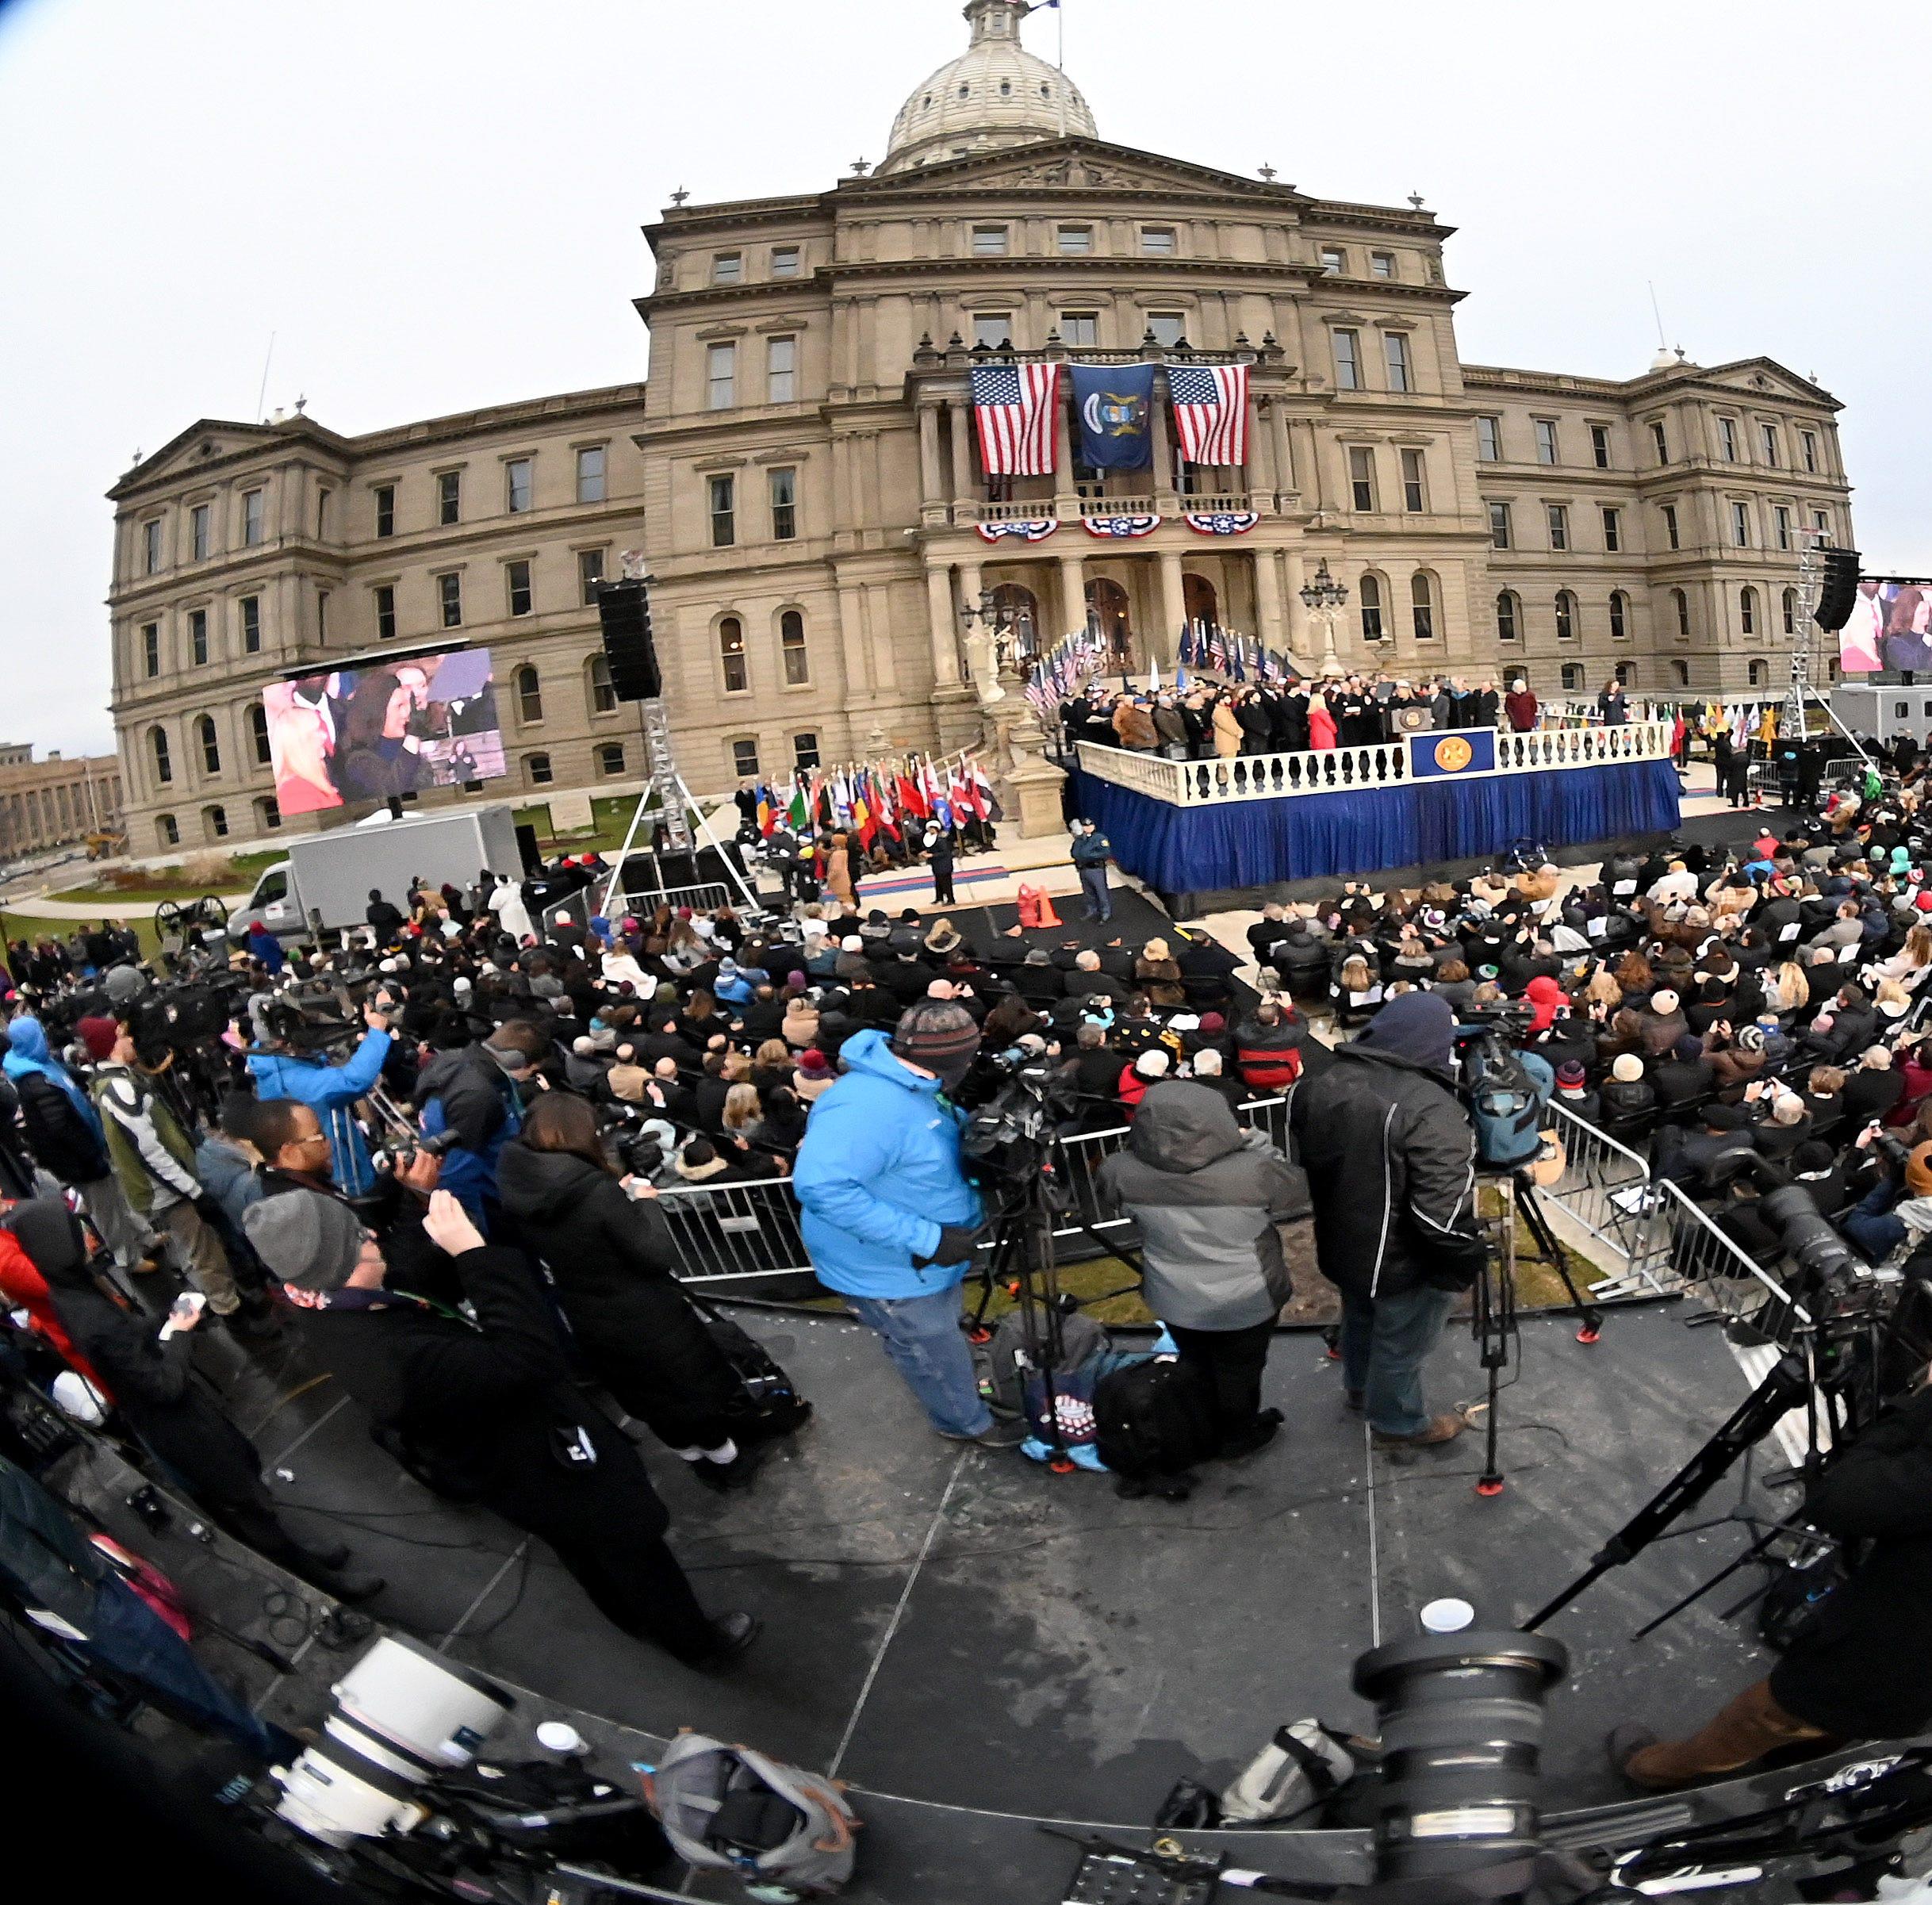 Opinion: End lobbyist revolving door